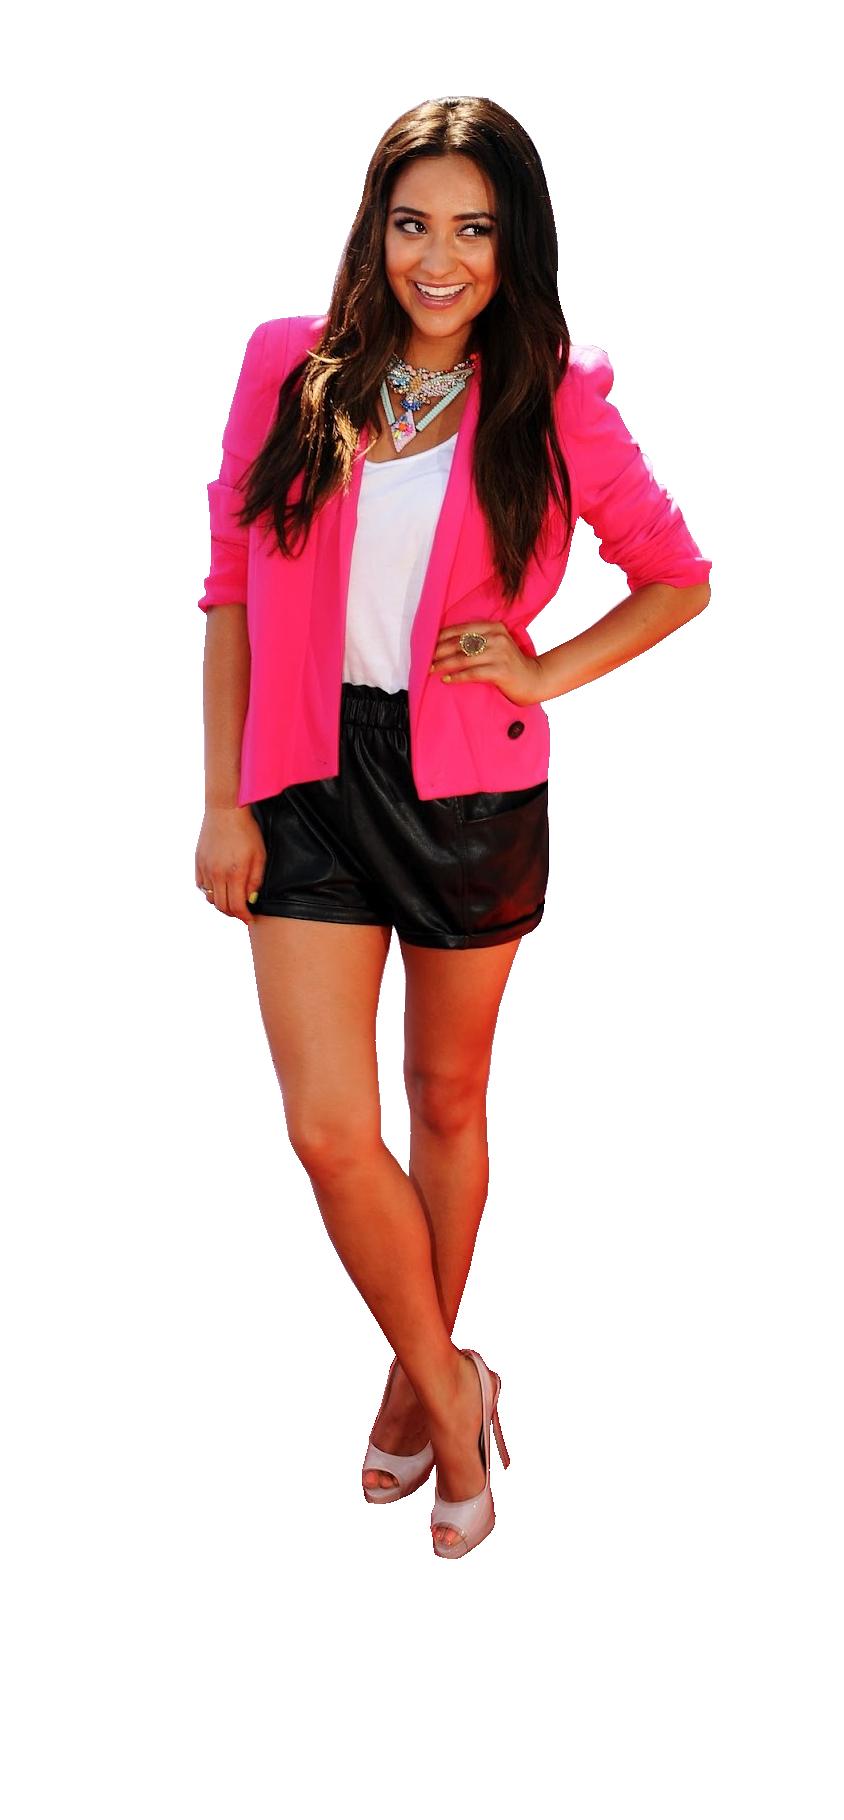 Austin Mahone Ariana Grande - Hot Girls Wallpaper